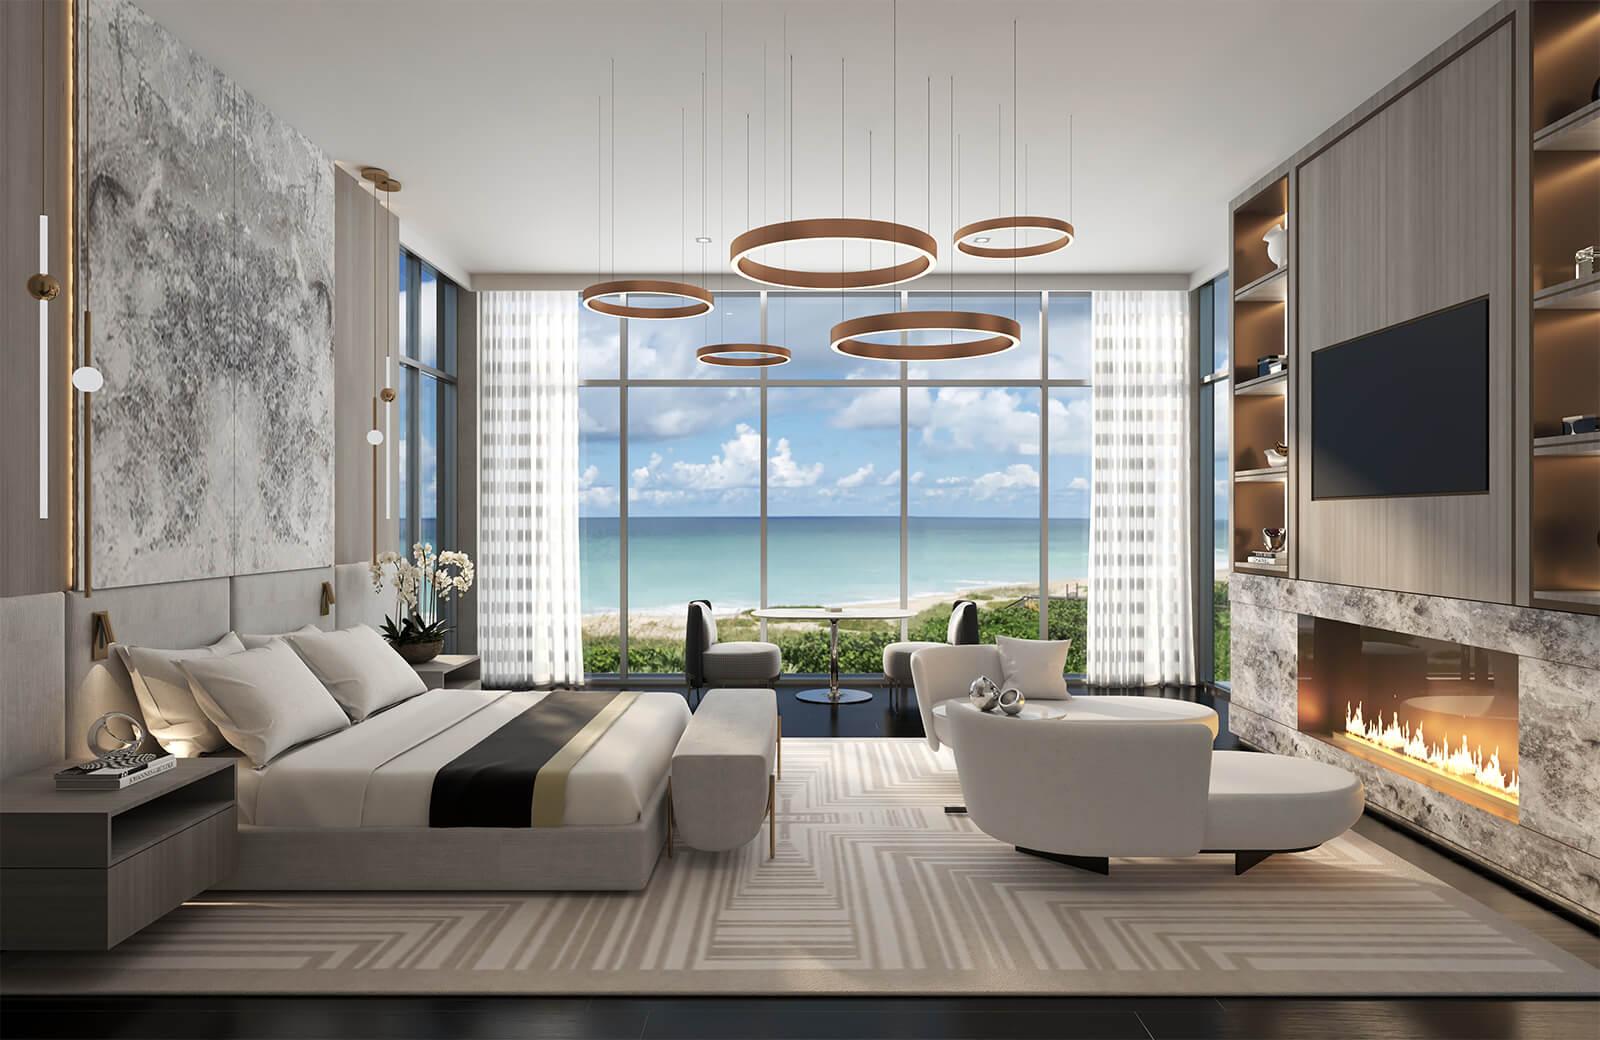 BEACHFRONT RESIDENCE by Britto Charette Interior Design